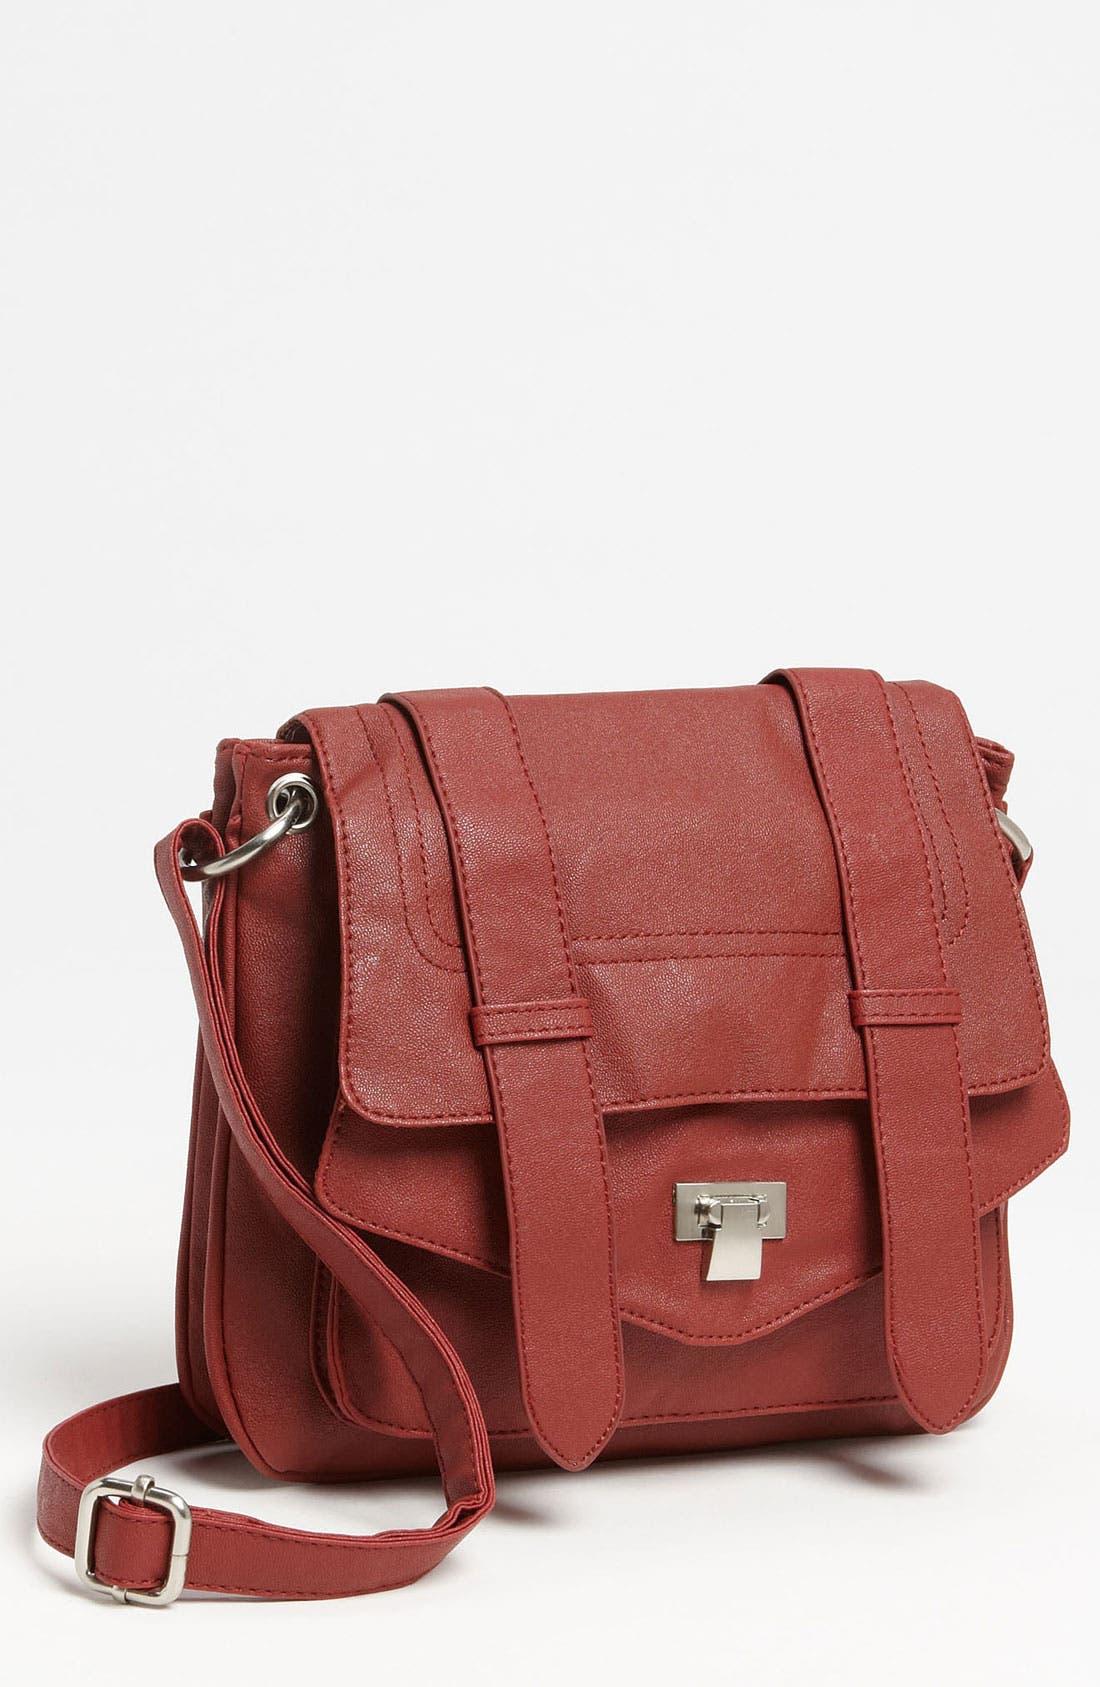 Alternate Image 1 Selected - Cesca 'Flip It' Crossbody Bag